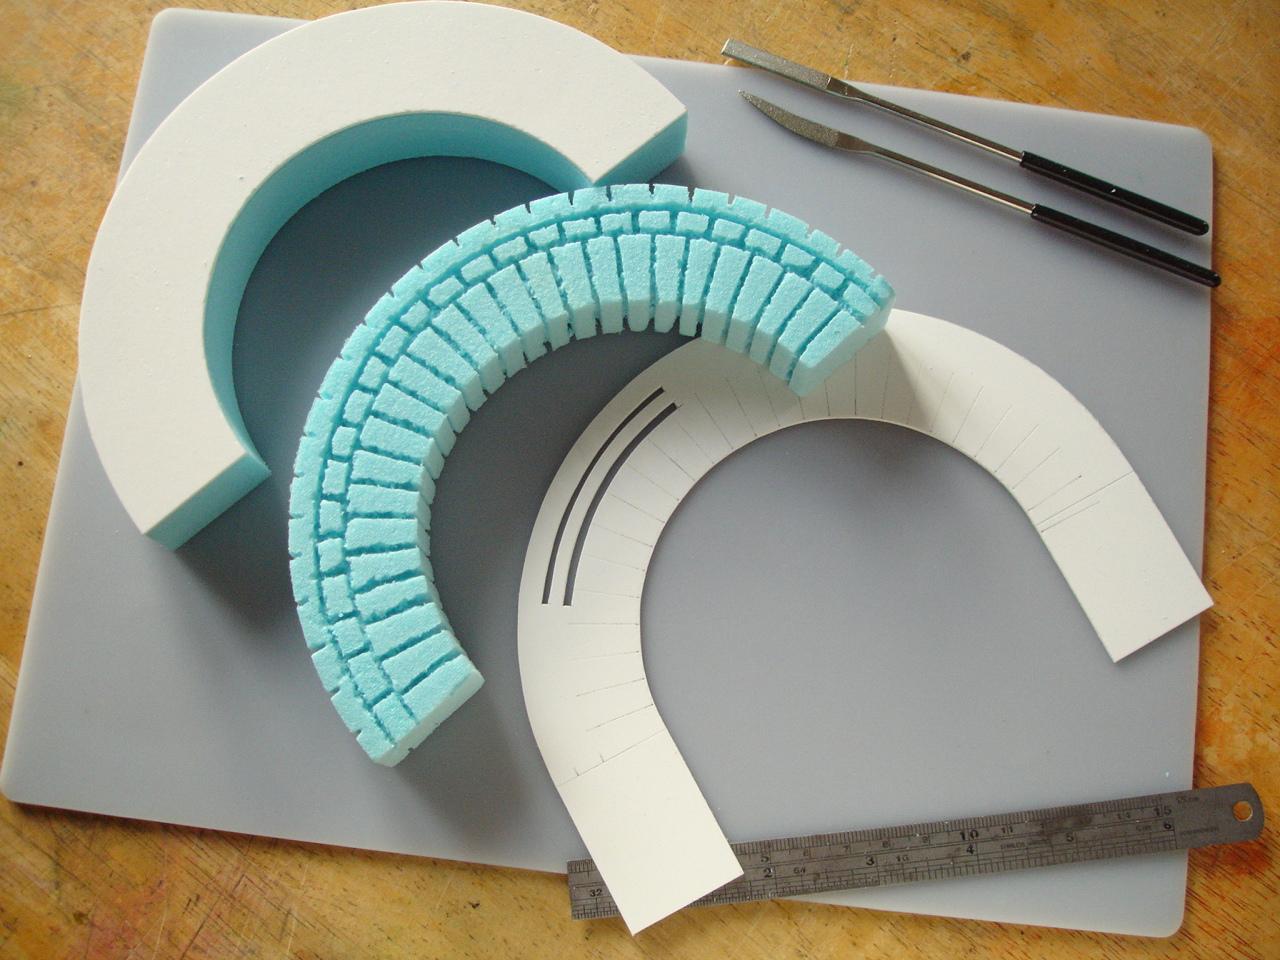 Making a brickwork arch in styrofoam